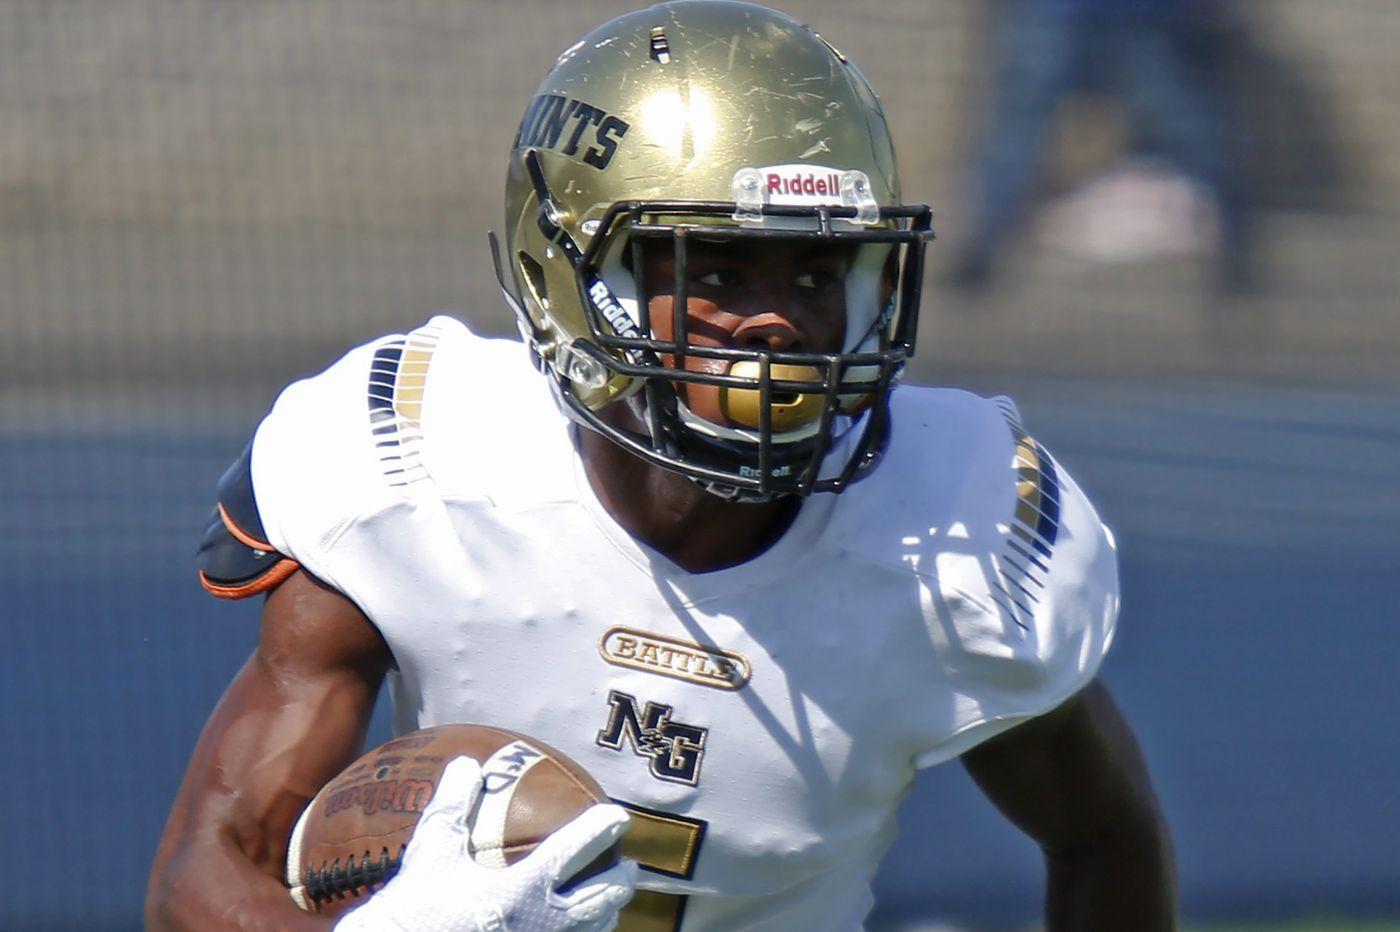 Neumann-Goretti's Tysheem Johnson recalls his six-touchdown day